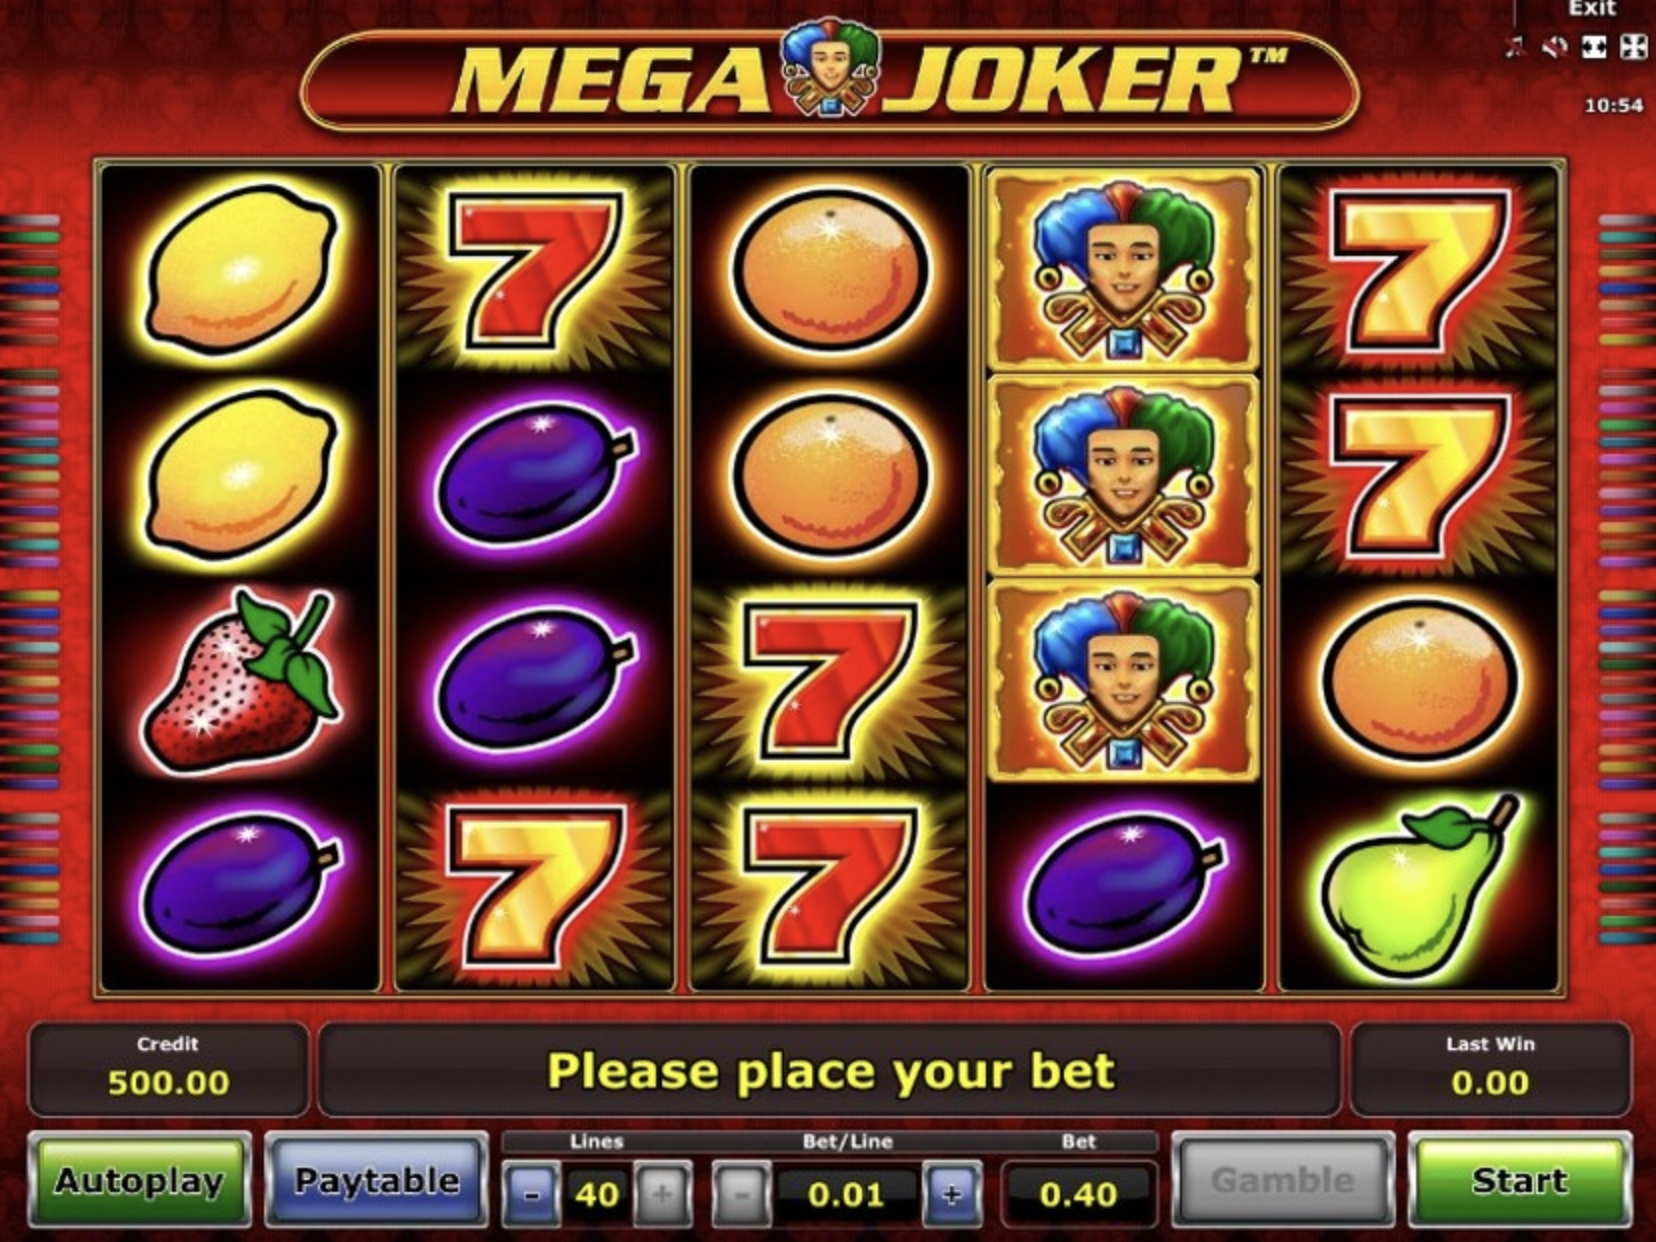 Joker Slot a Must Try Game on Online Casino